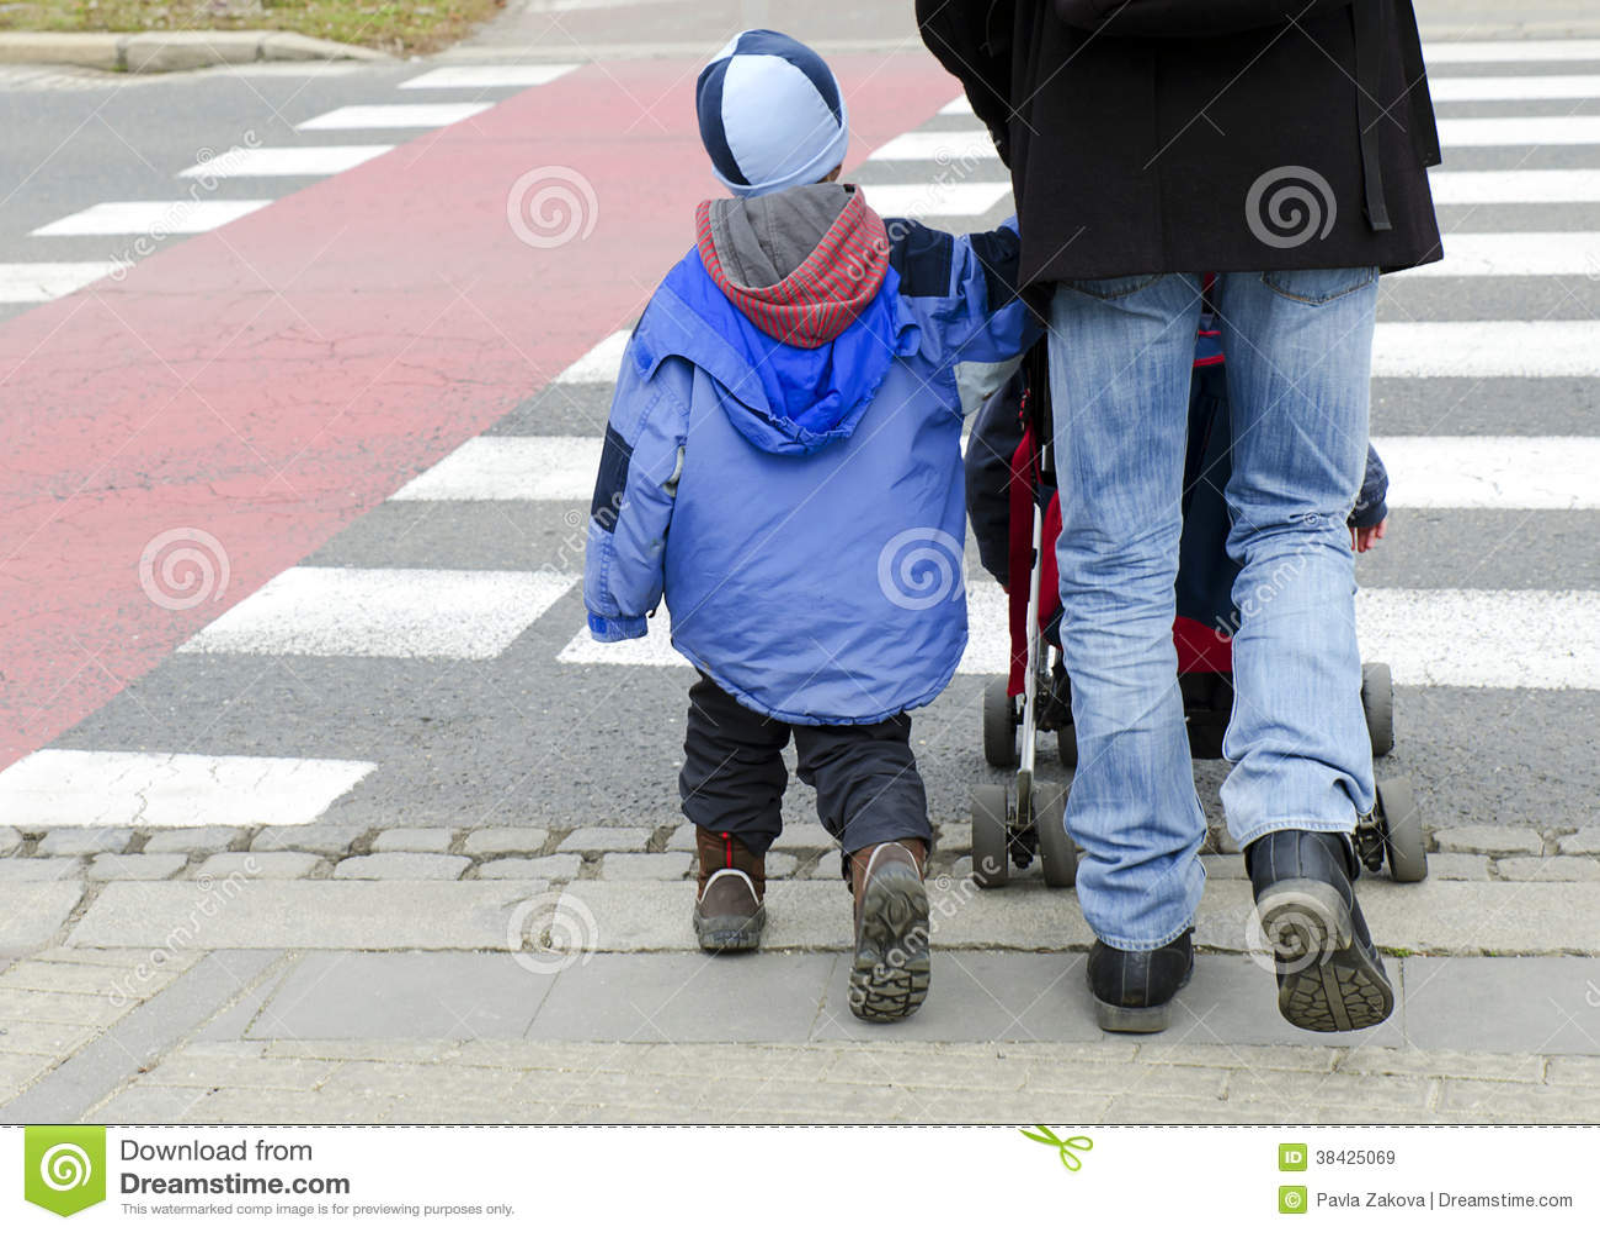 Дети на зебре фото